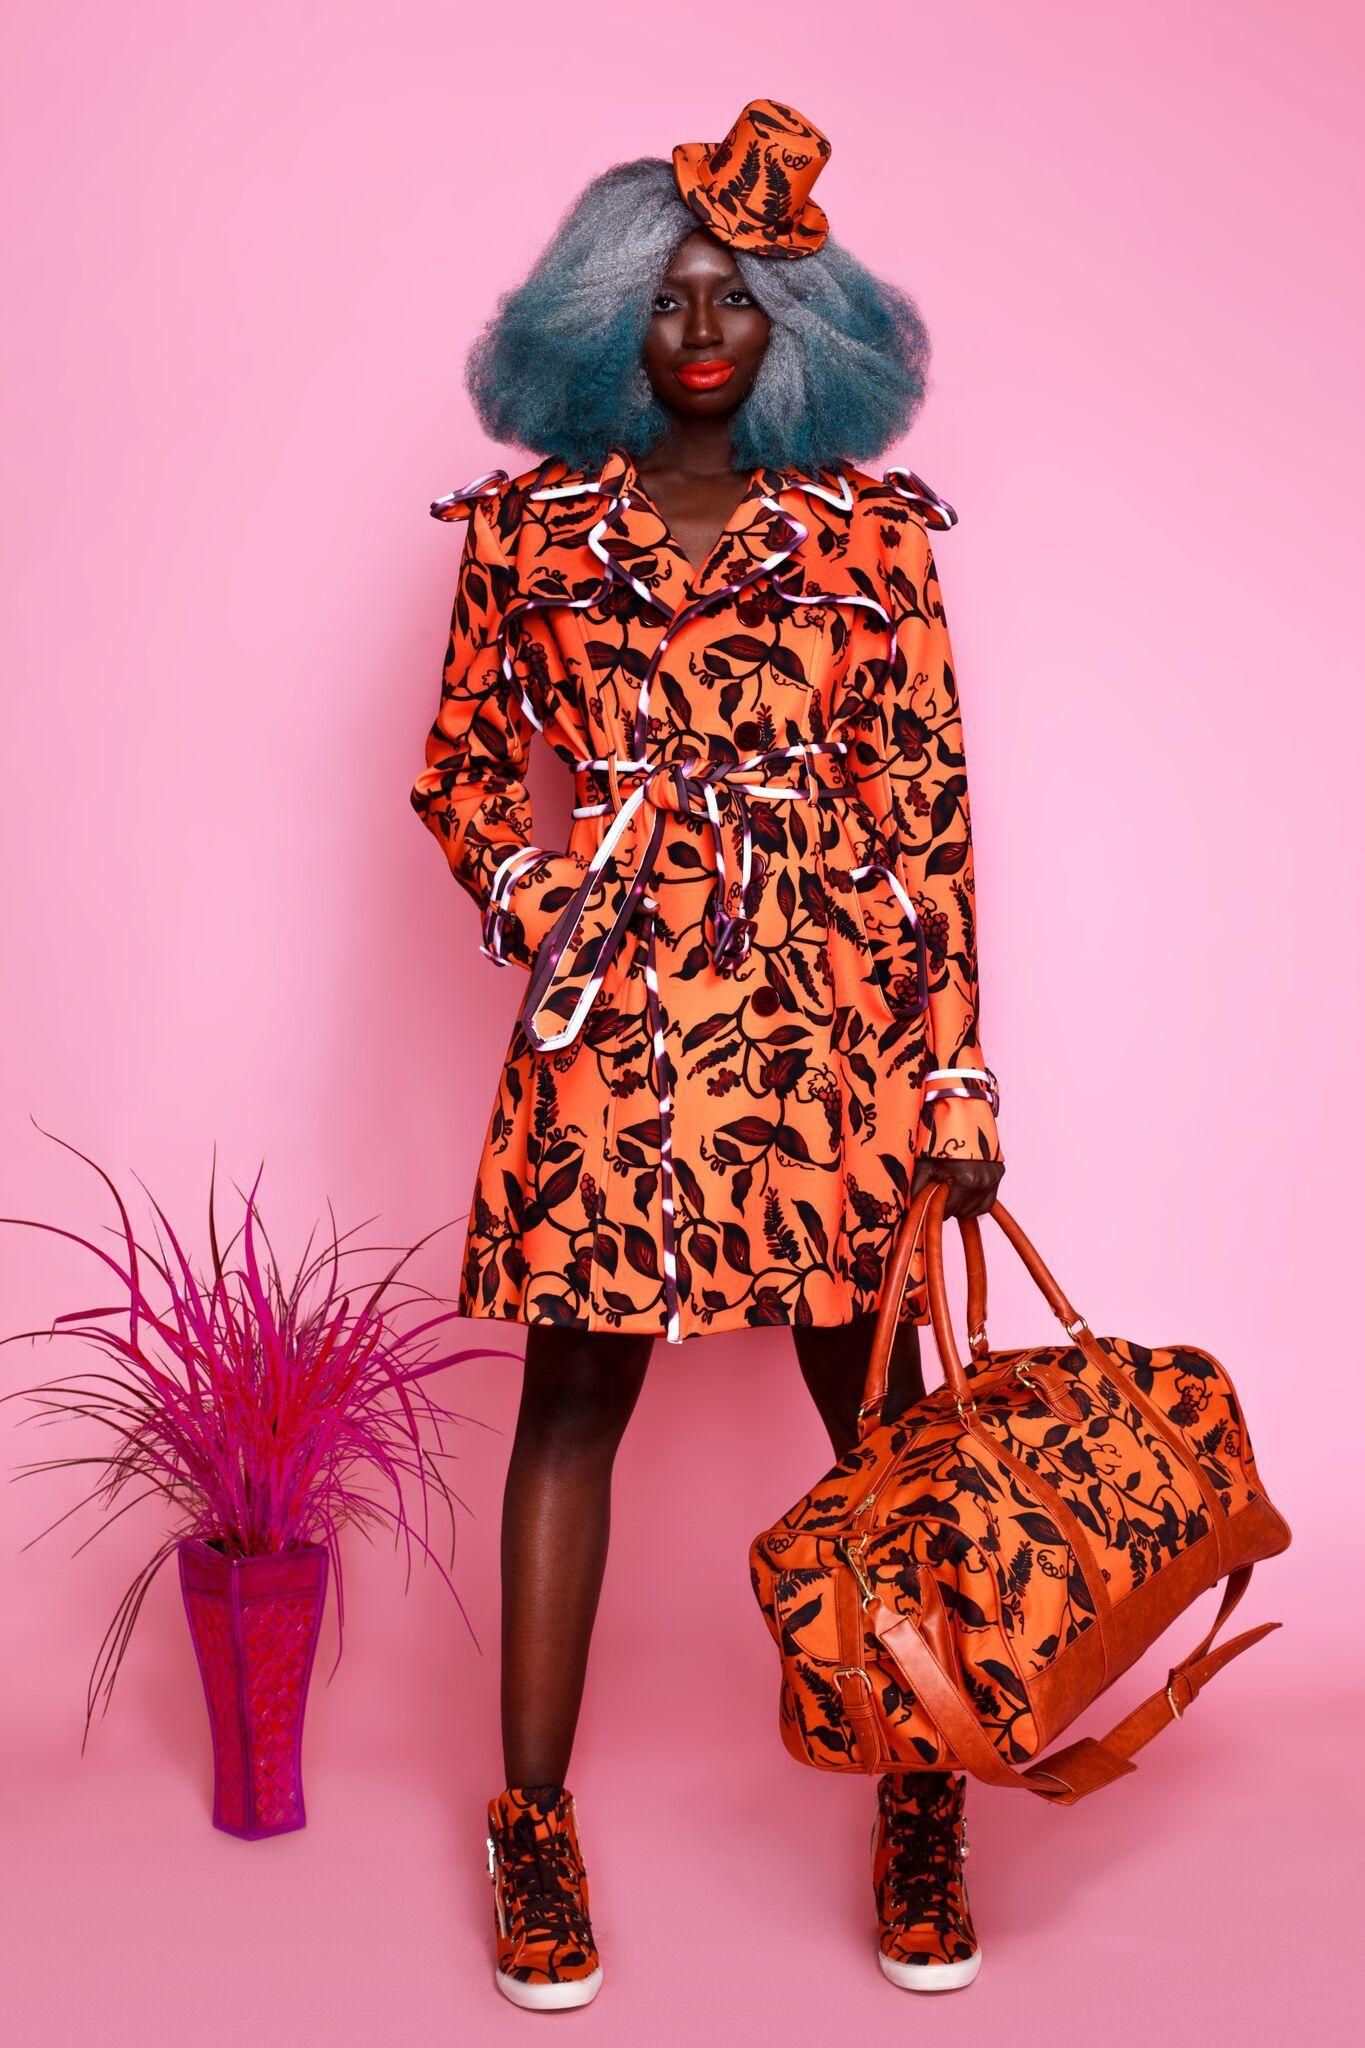 Pin de addolat en African Barbie Collection | Pinterest